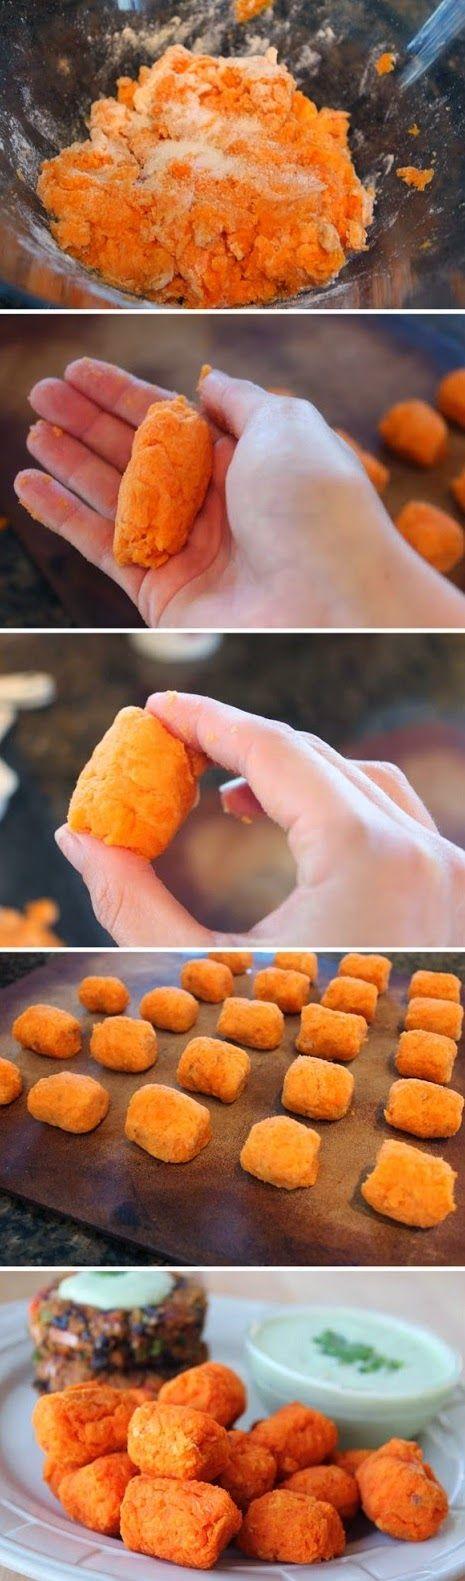 Homemade Baked Sweet Potato Tots